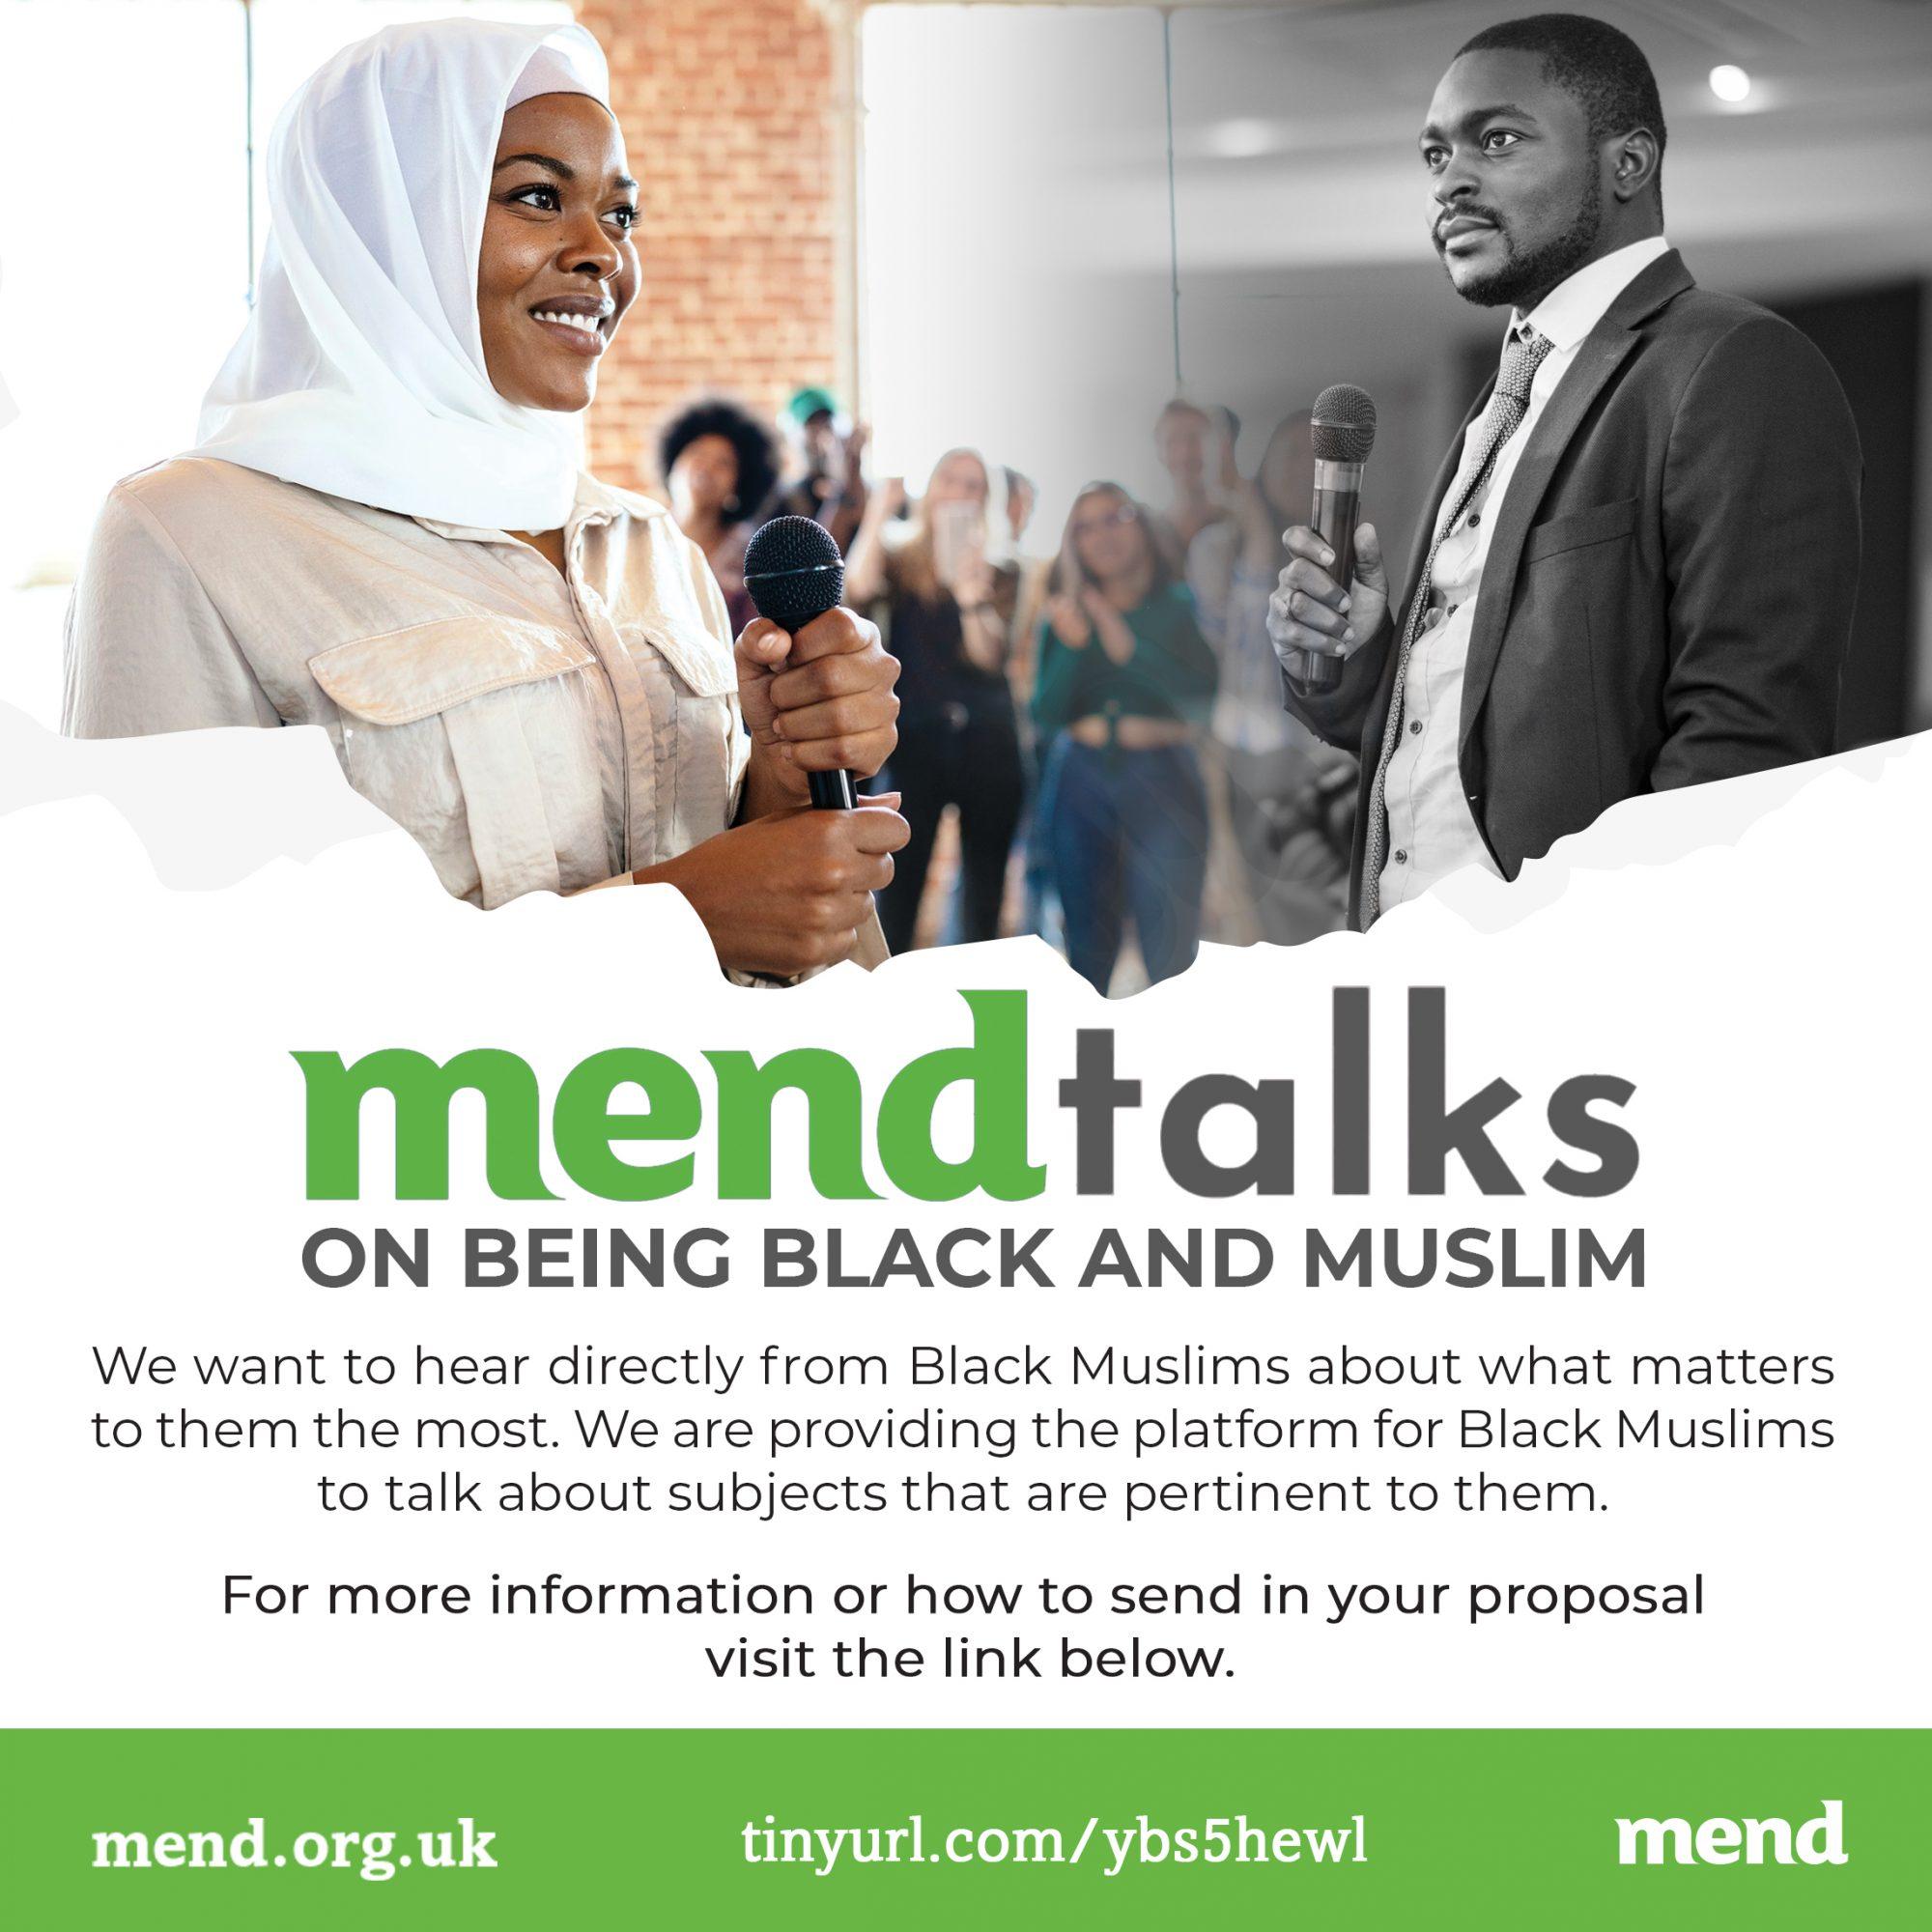 MENDTalks: On Being Black and Muslim (Contributors)